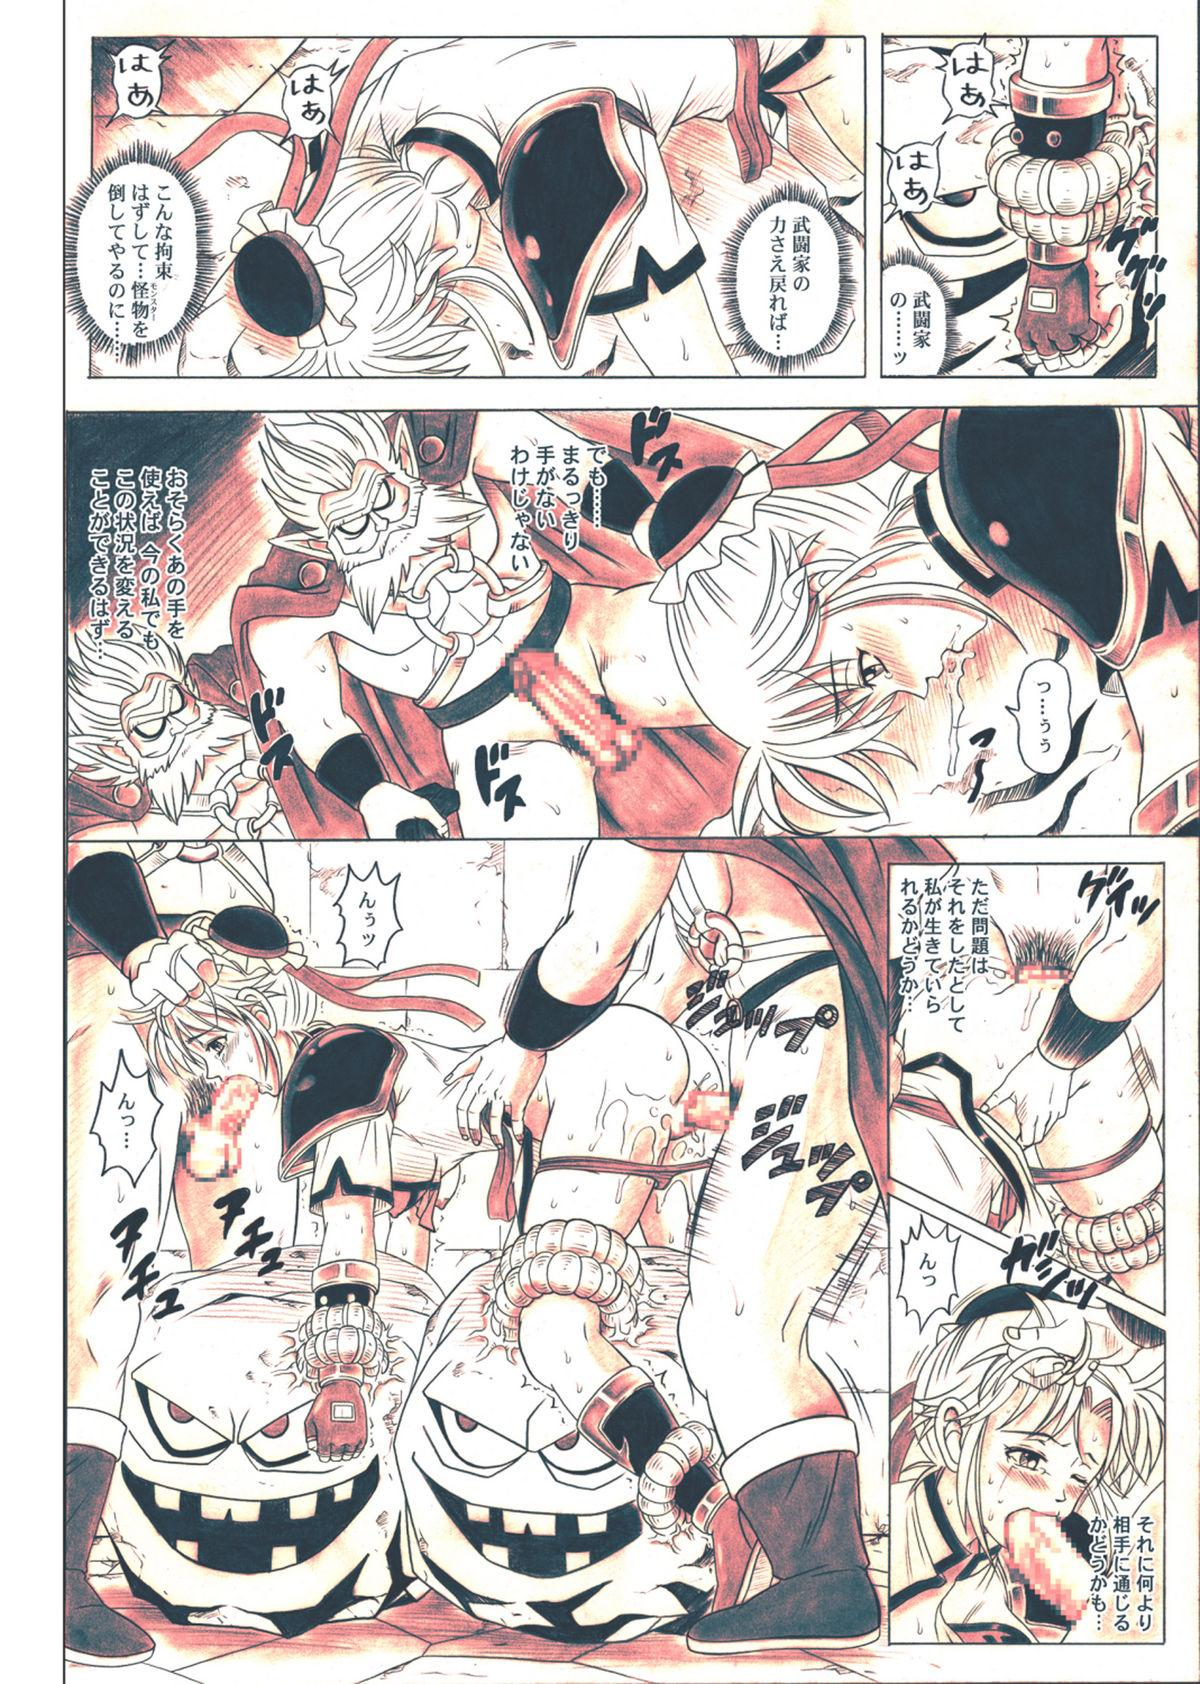 [Cyclone (Reizei, Izumi)] STAR TAC IDO ~Youkuso Haja no Doukutsu he~ Chuuhen Download edition (Dragon Warrior: Dai's Great Adventure) [Digital] 85